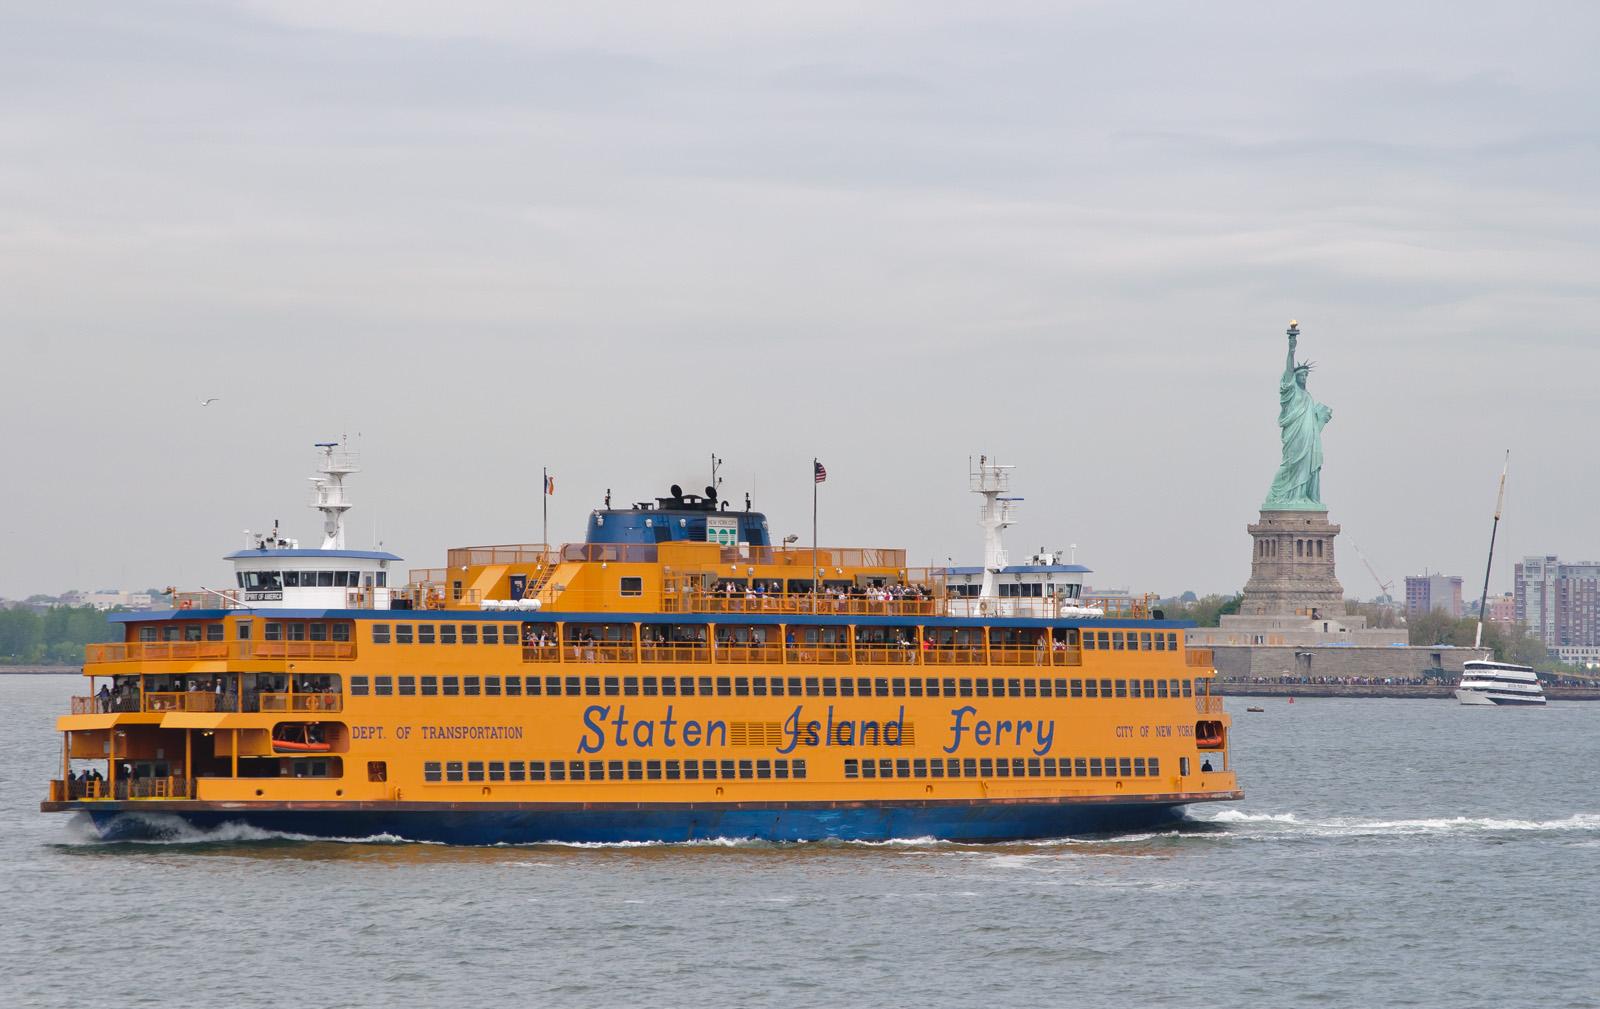 Spirit_of_America_-_Staten_Island_Ferry.jpg